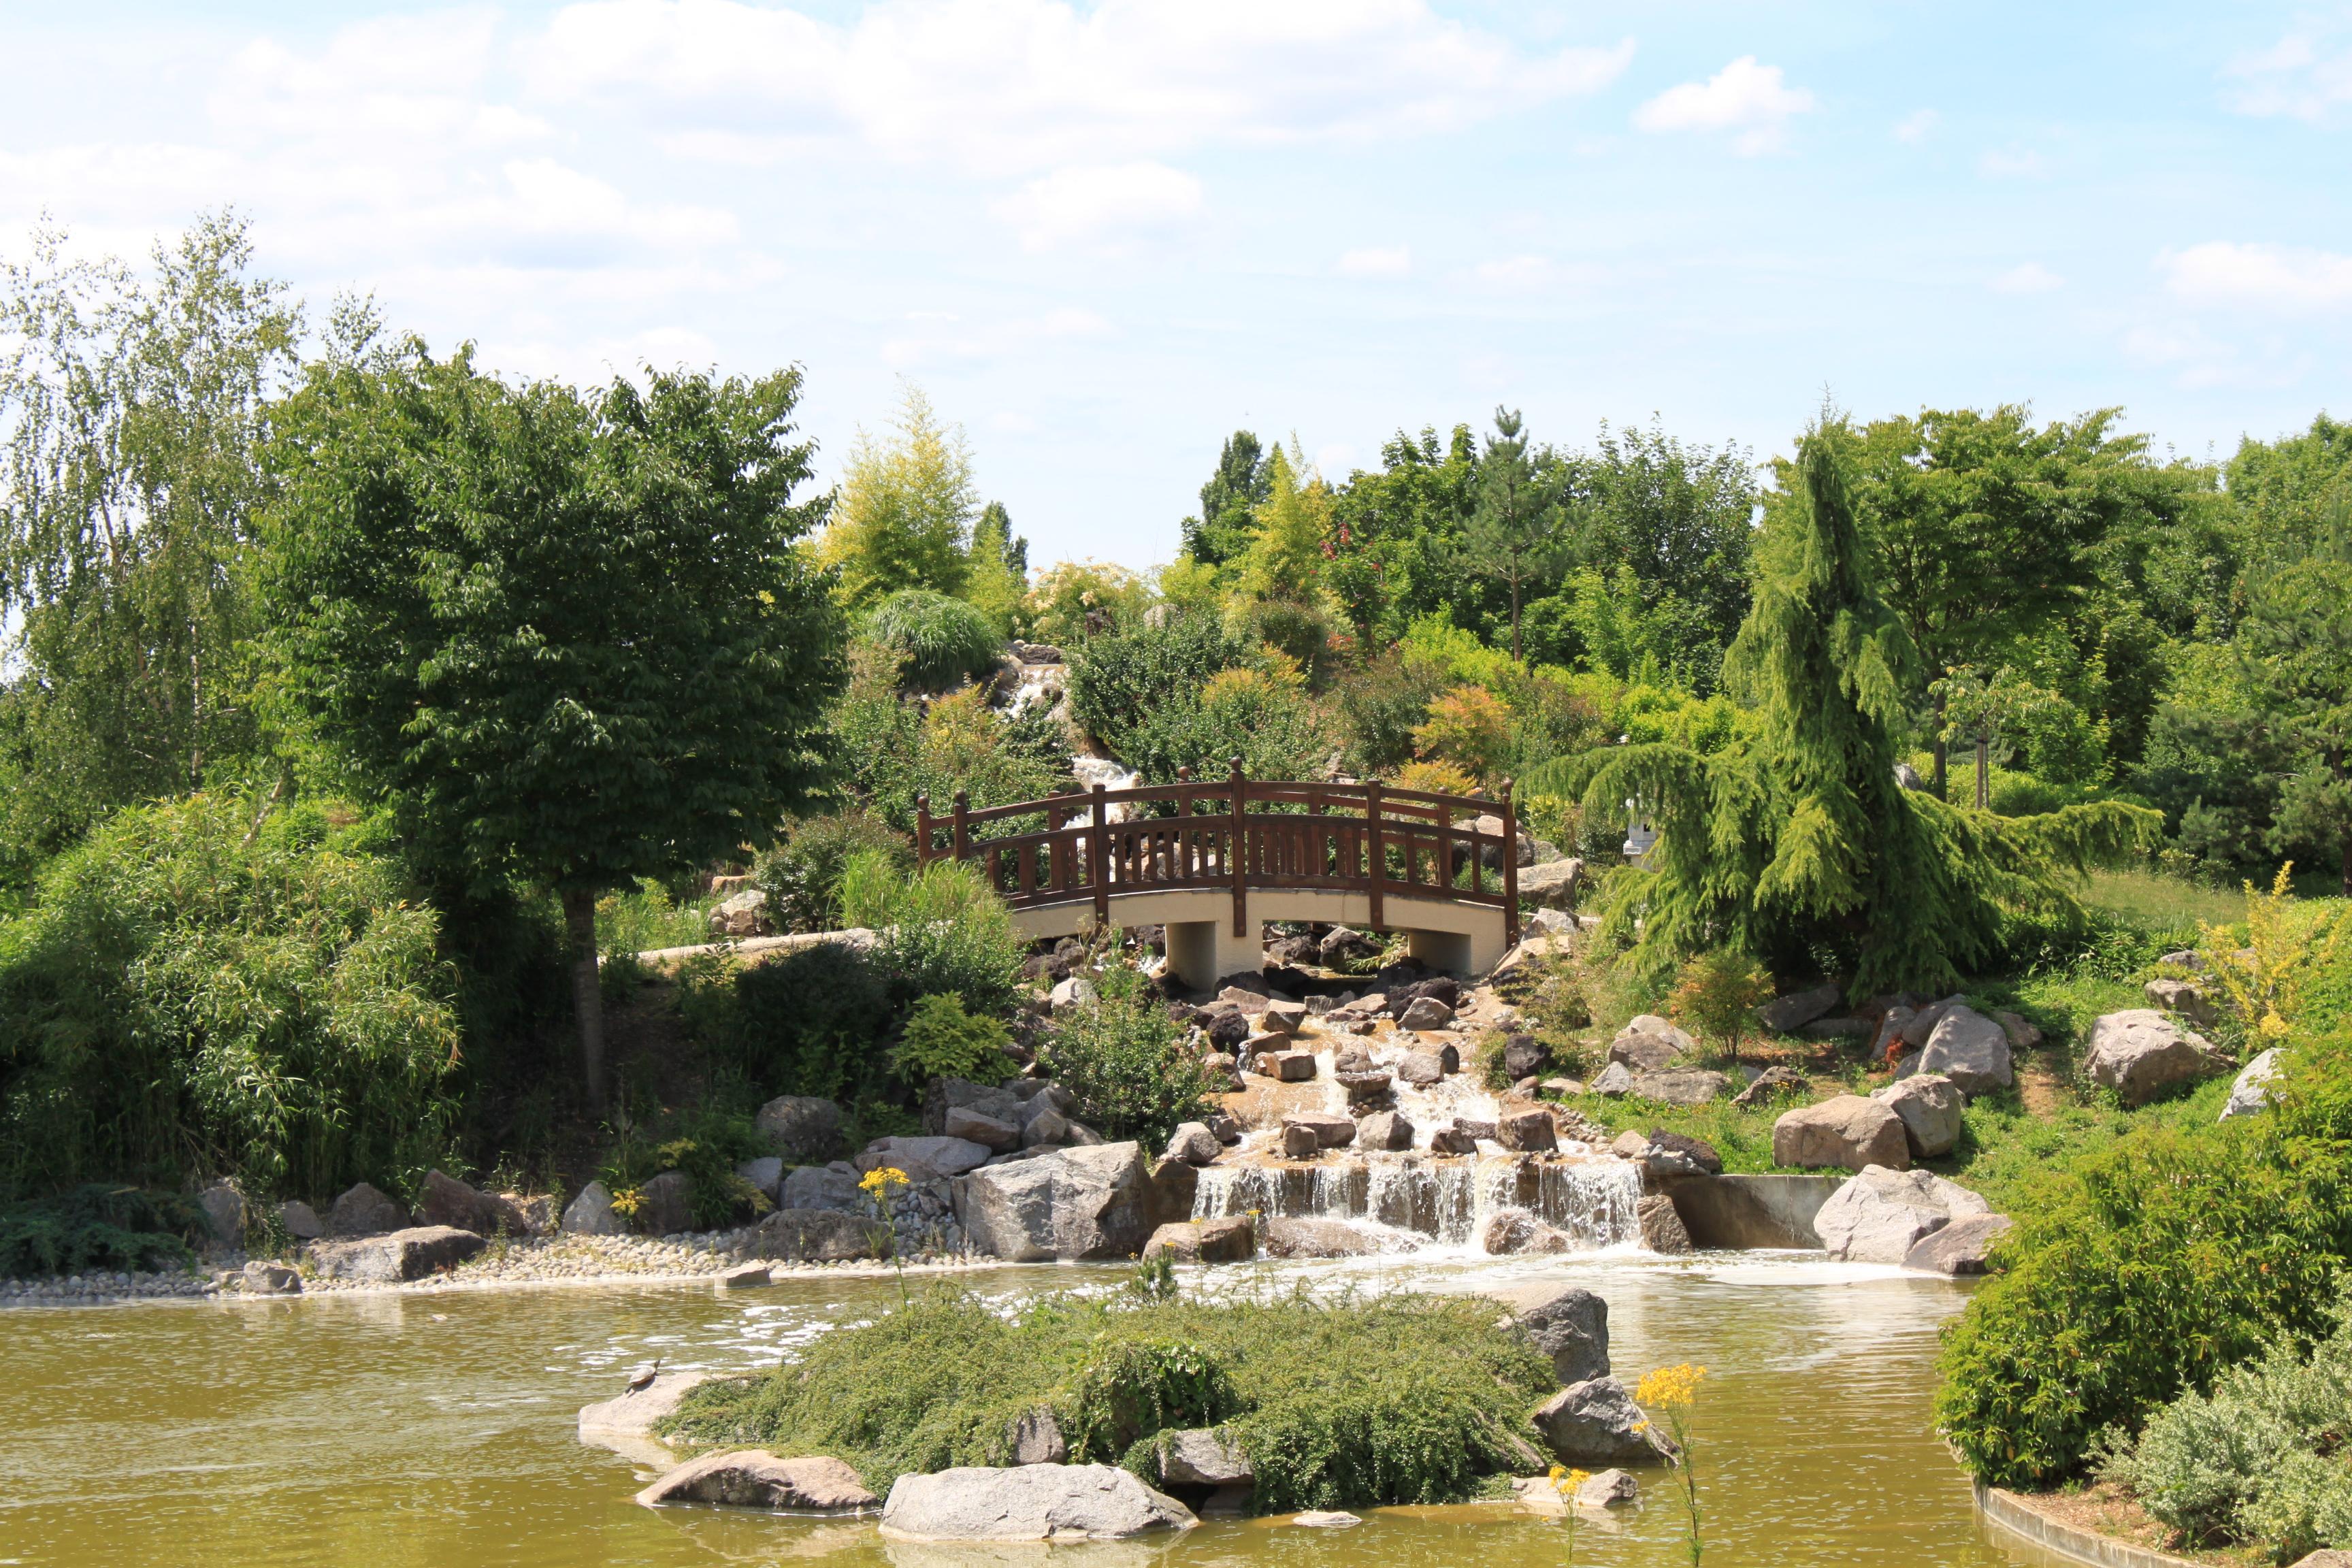 File Dijon Jardin japonais 04 Wikimedia mons